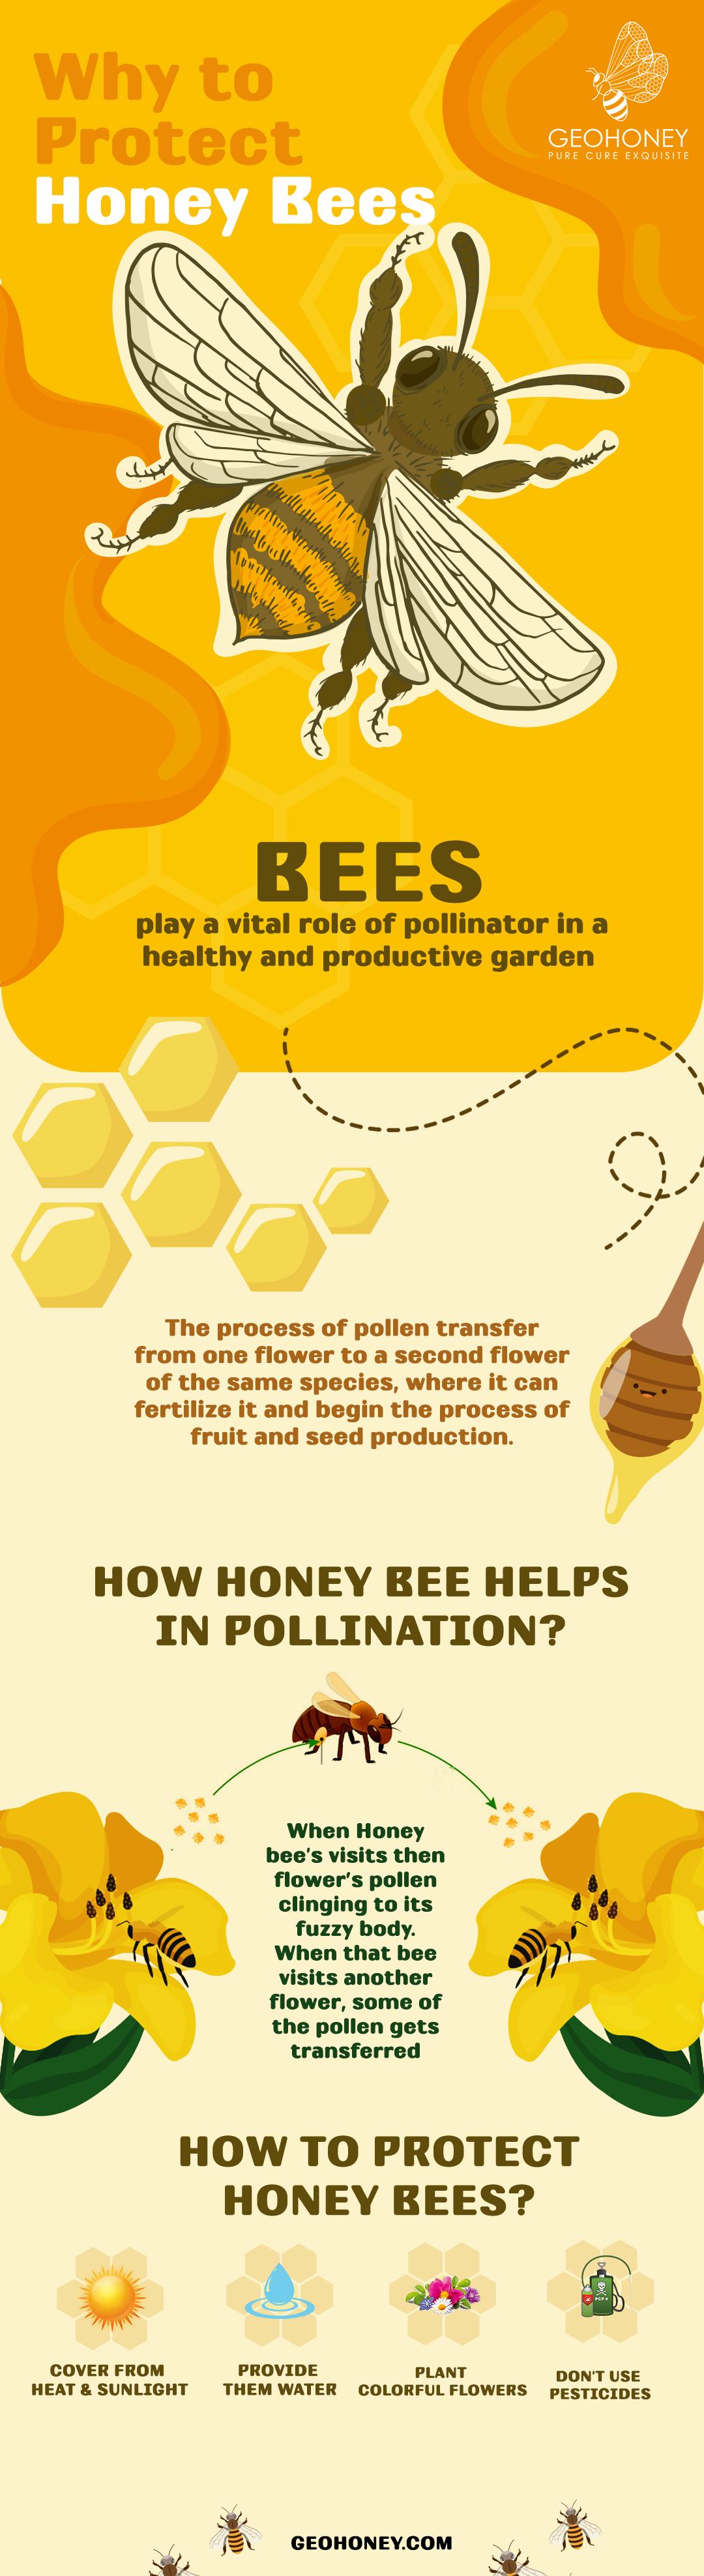 Protect Honey Bees - Geohoney